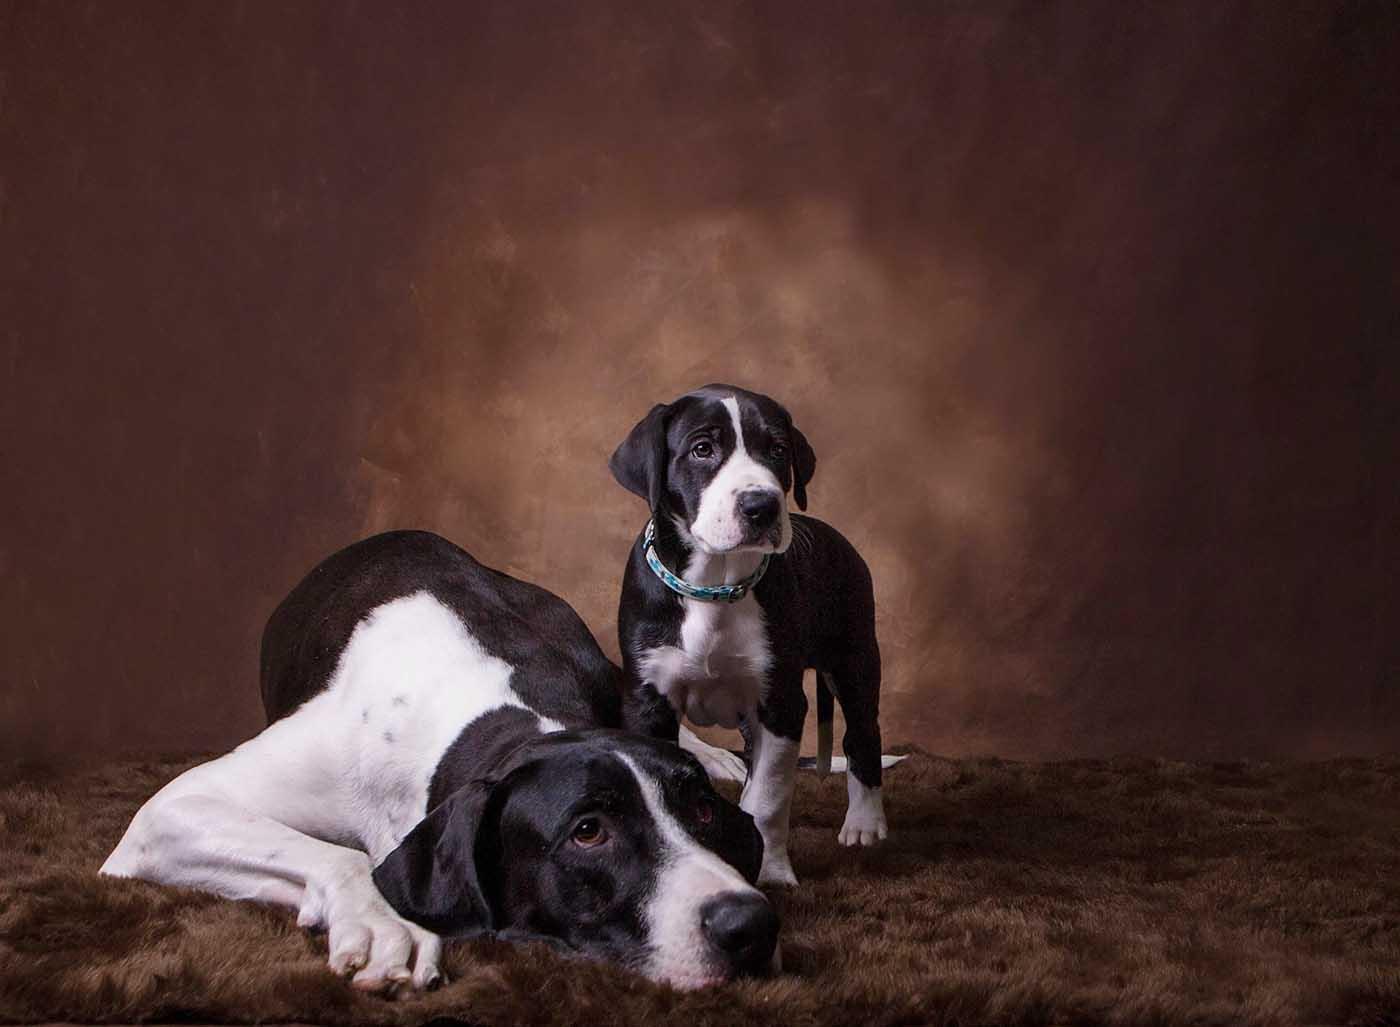 Dog-Photographer-St-Louis-1.jpg